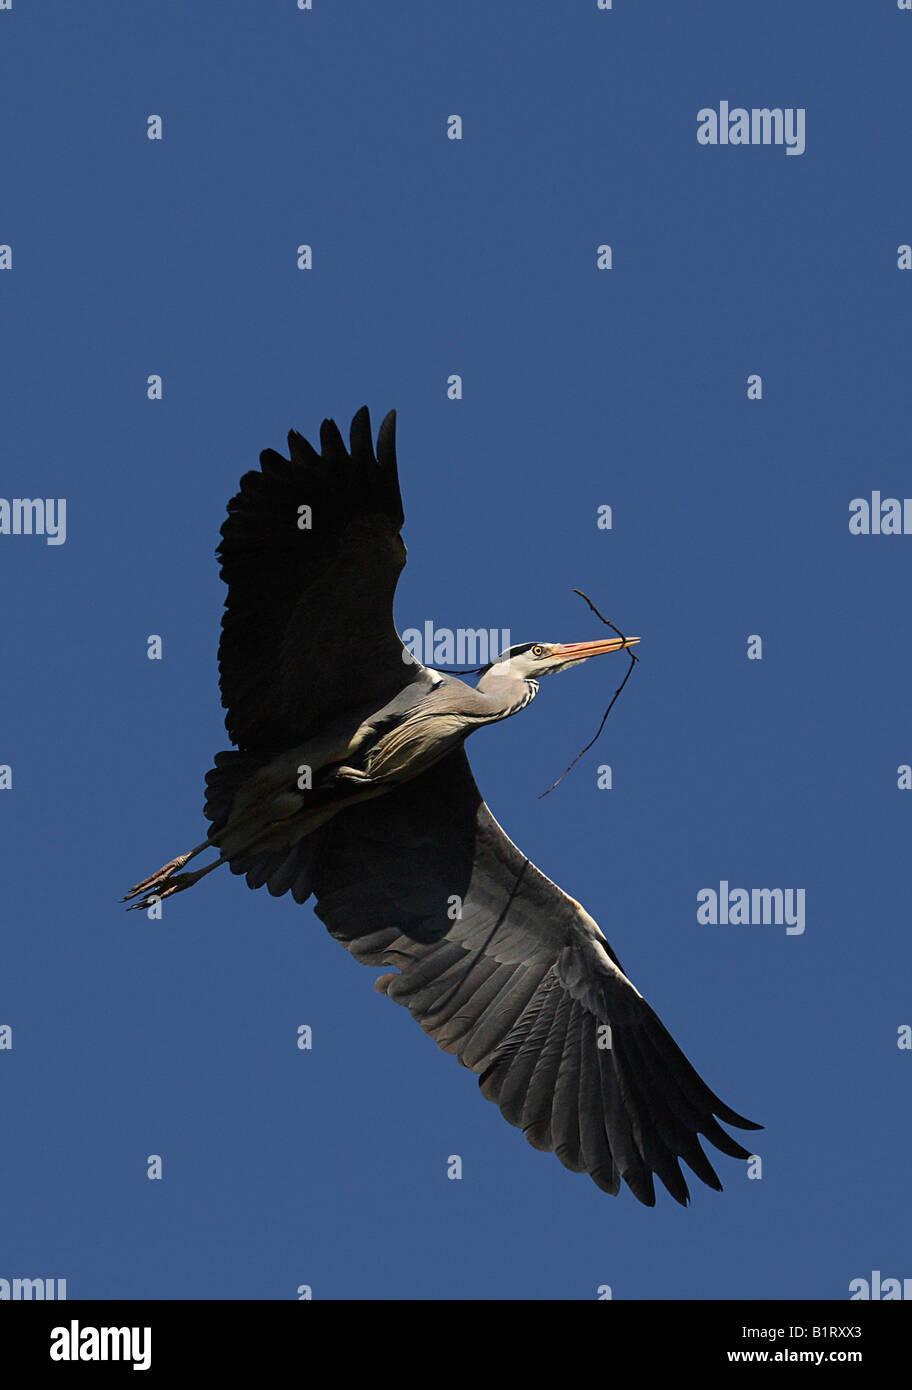 Flying Grey Heron (Ardea cinerea), a twig in its beak - Stock Image